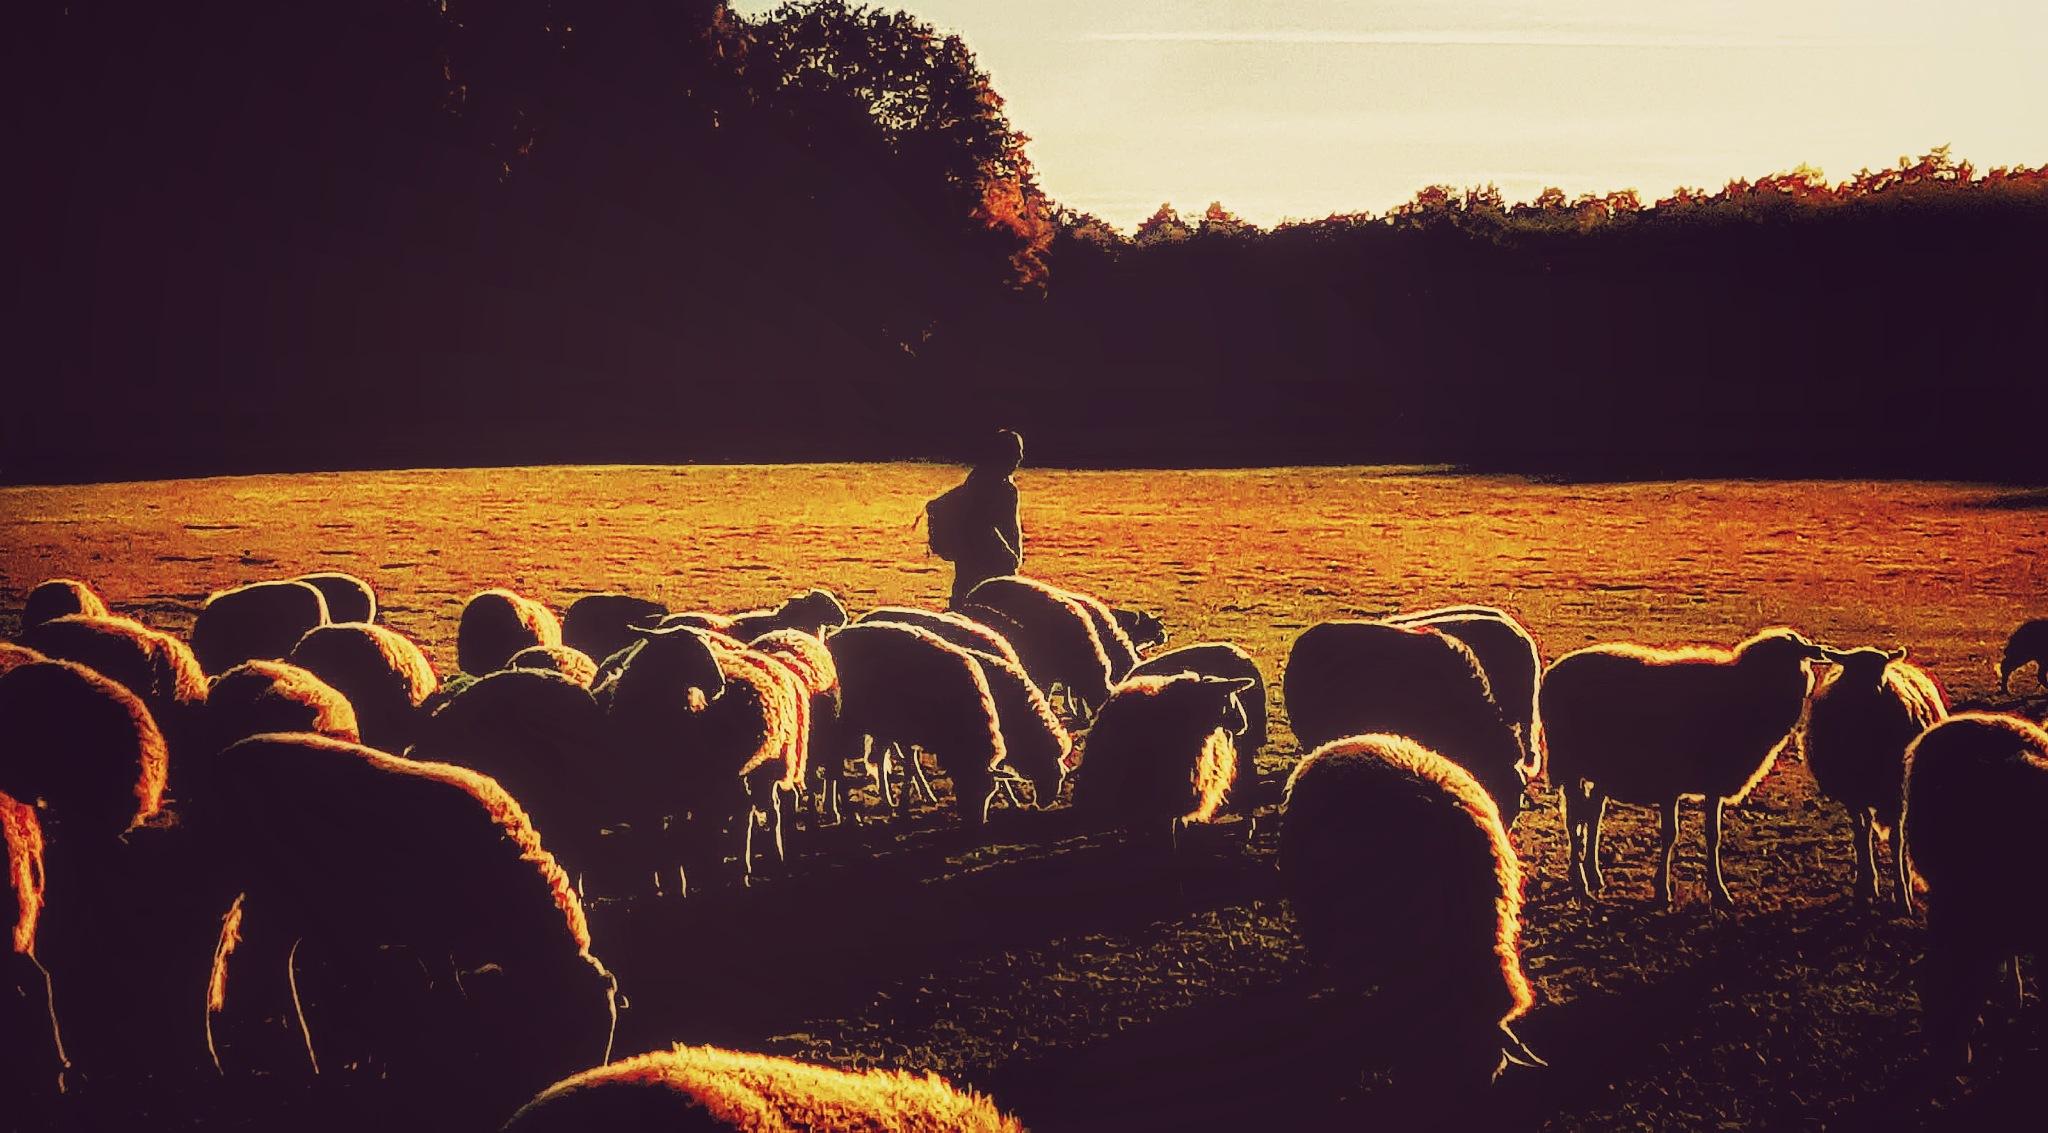 Return of the sheep by Jannie Looge